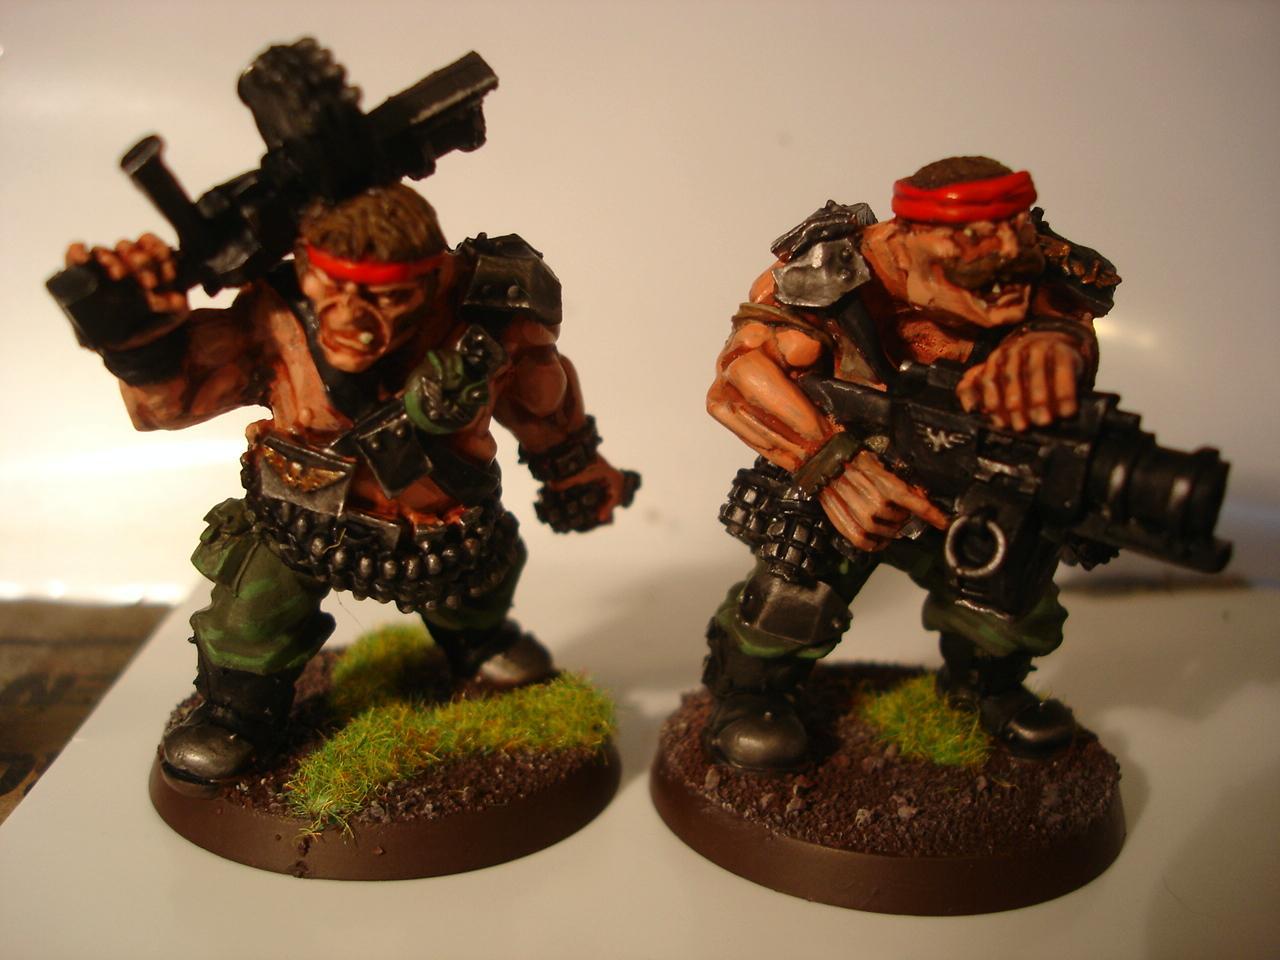 Catachan, Imperial Guard, Ogryns, Warhammer 40,000, Warhammer Fantasy